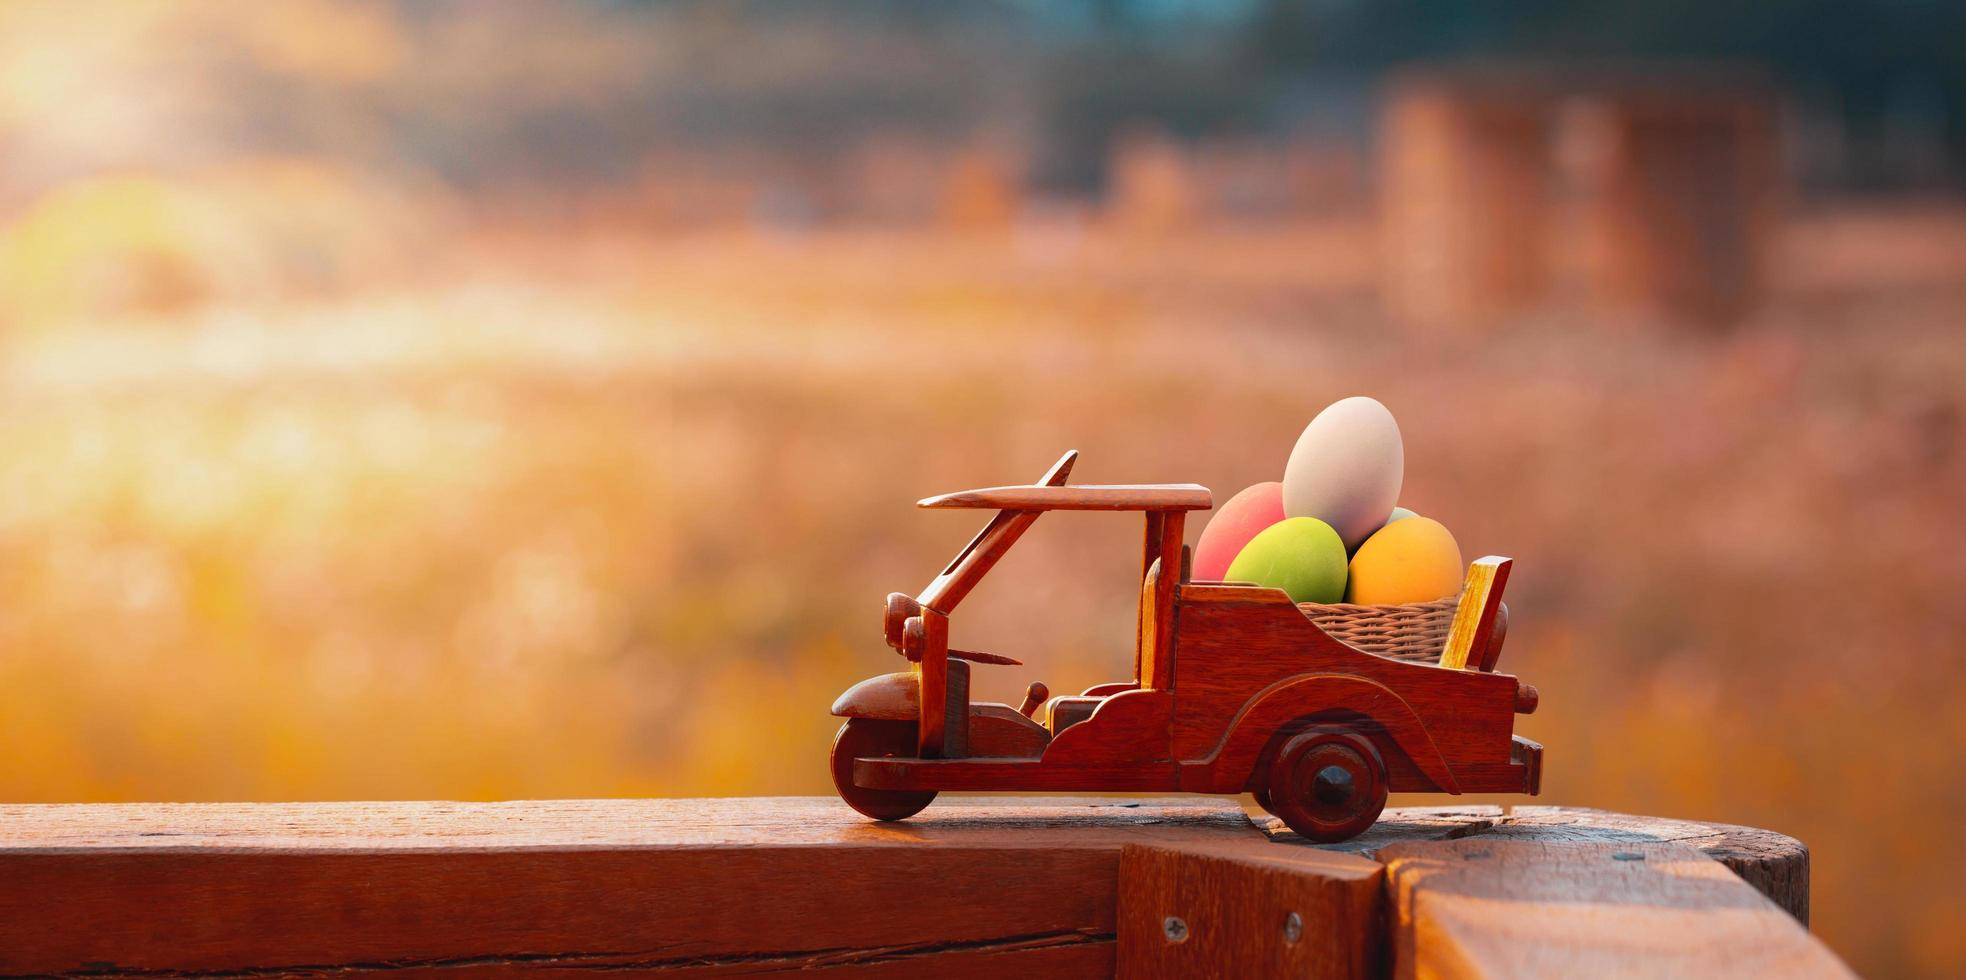 uova in macchinina foto